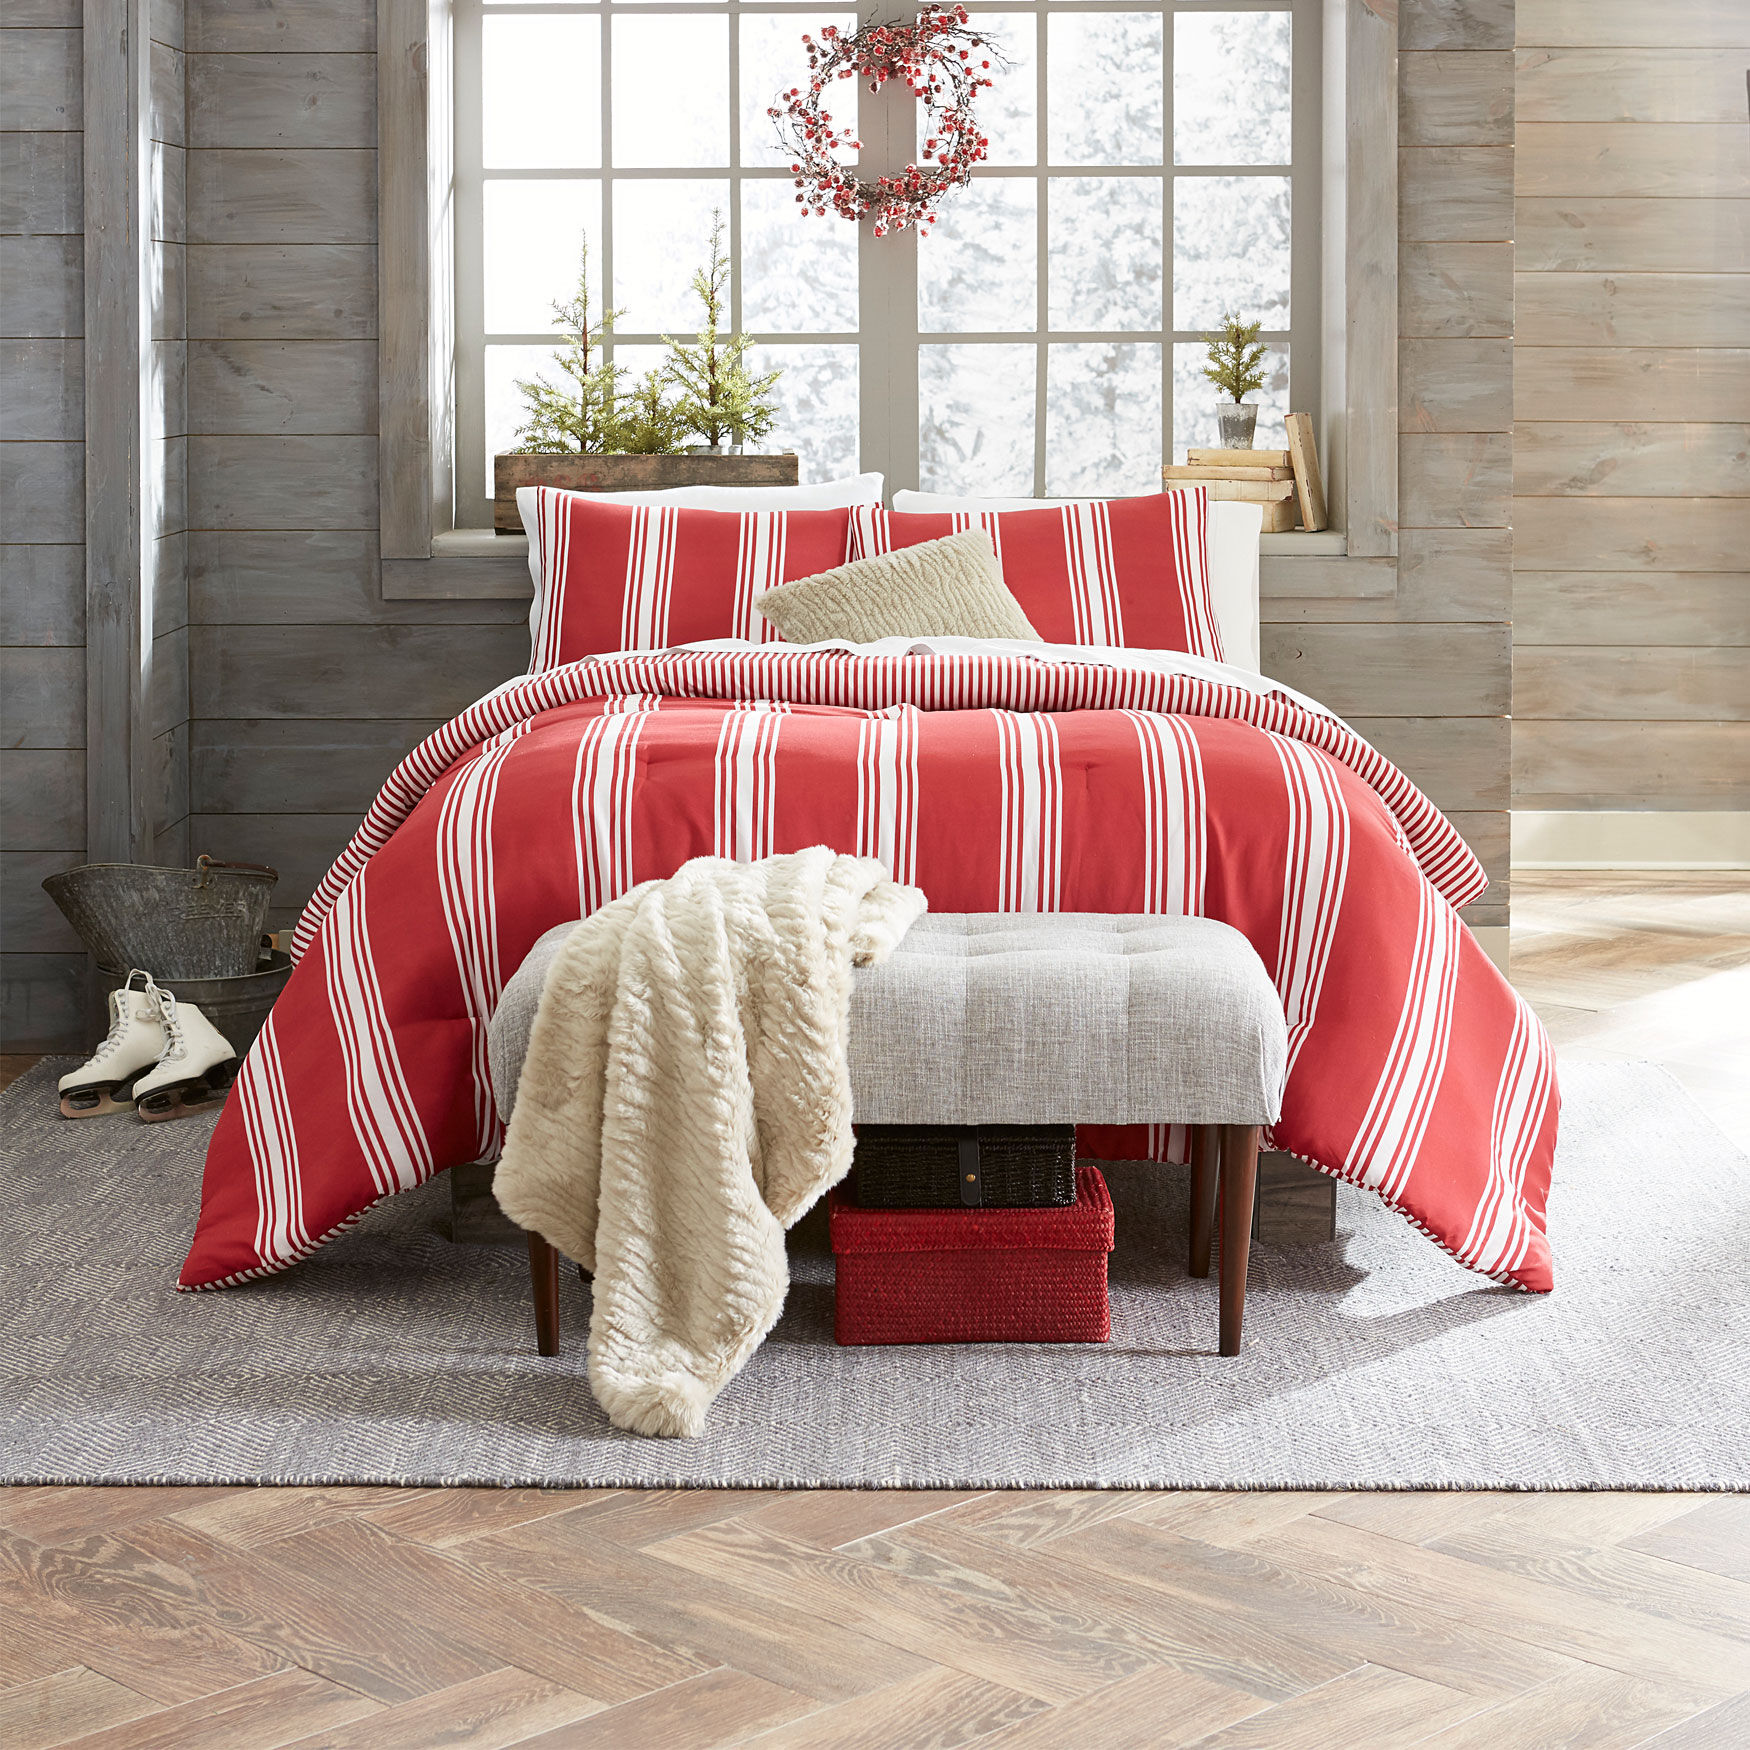 BH Studio® 4 Pc. Comforter Set